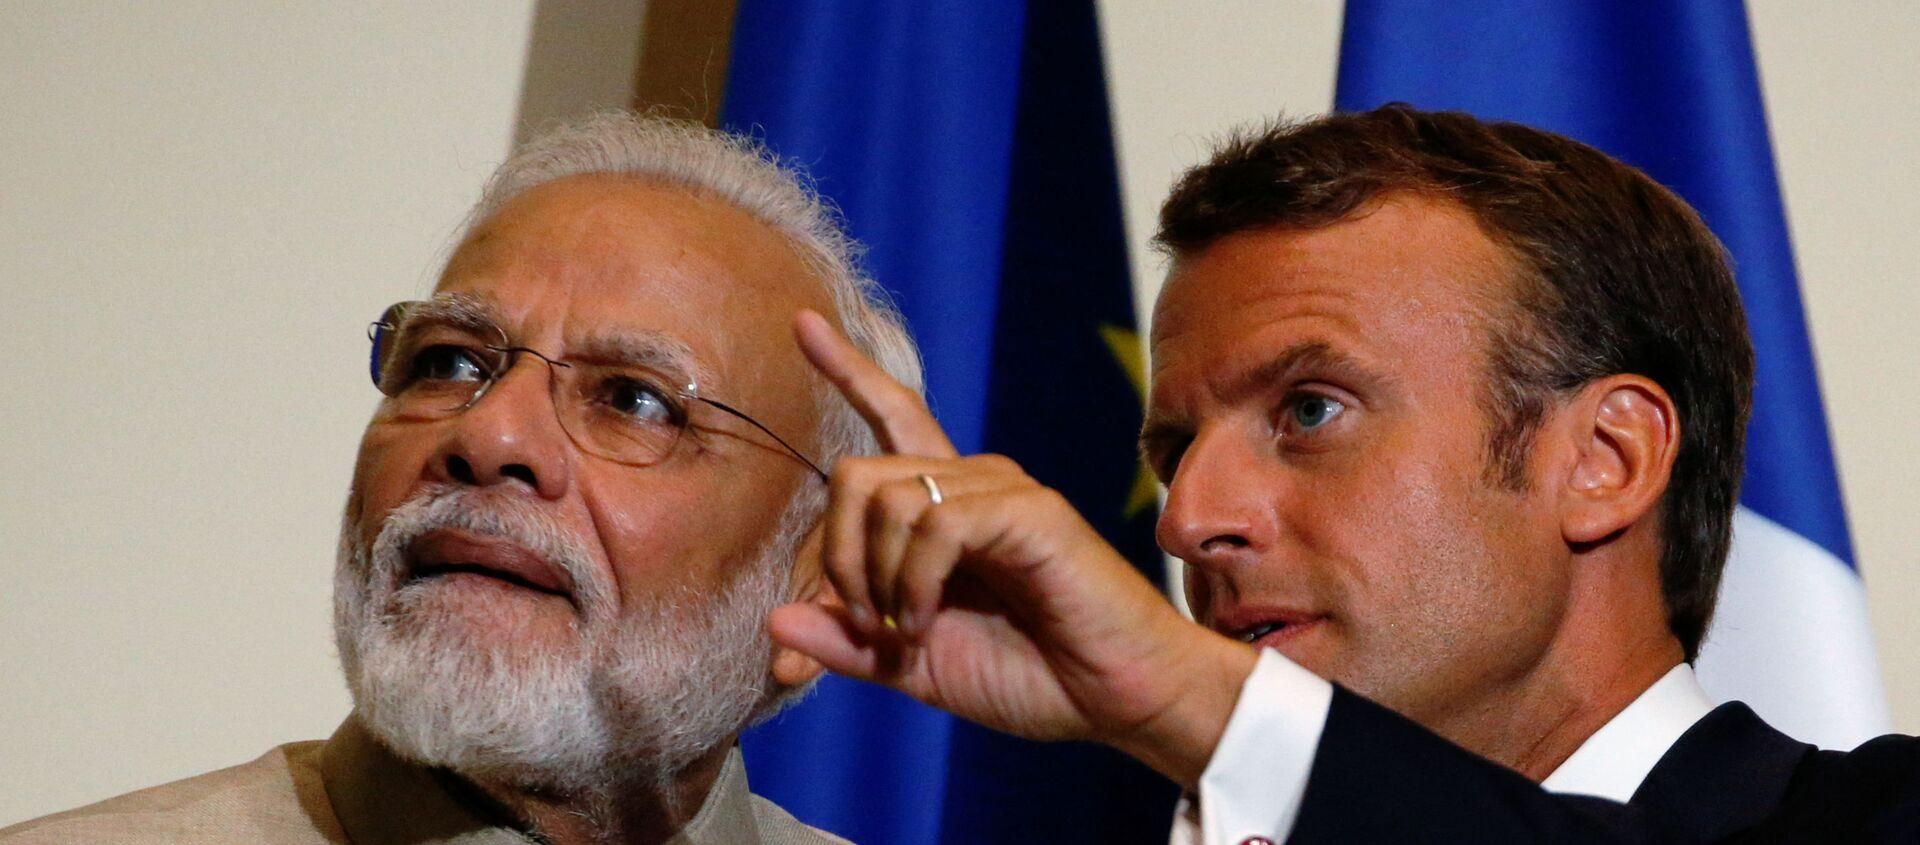 Narendra Modi et Emmanuel Macron - Sputnik France, 1920, 16.04.2021